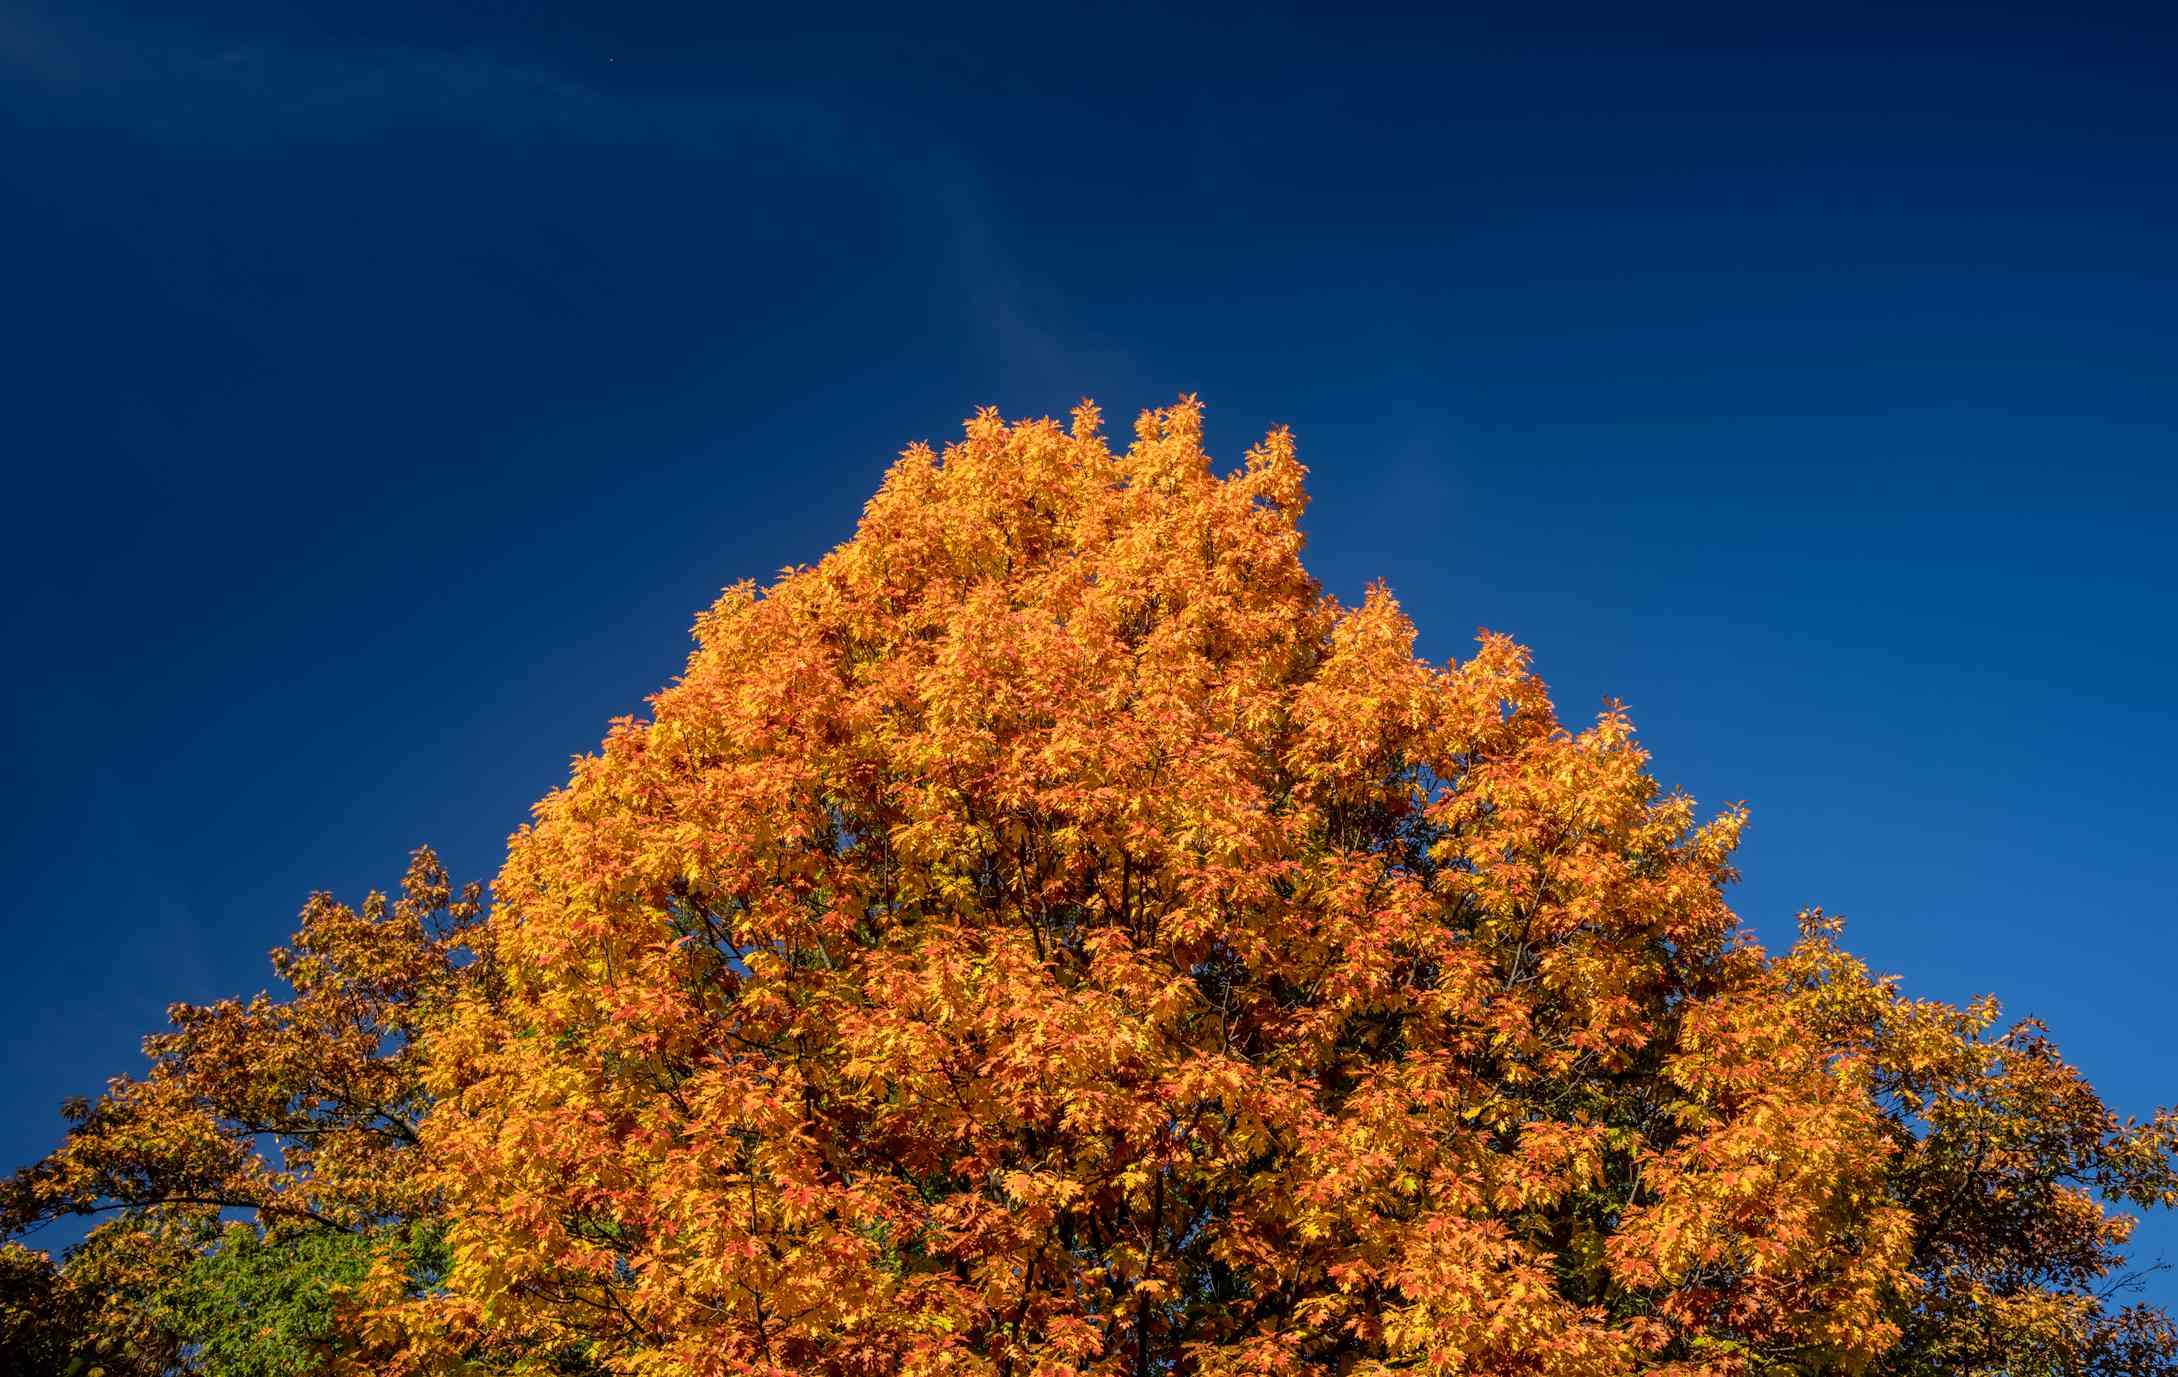 A Pin Oak canopy against a clear blue sky.